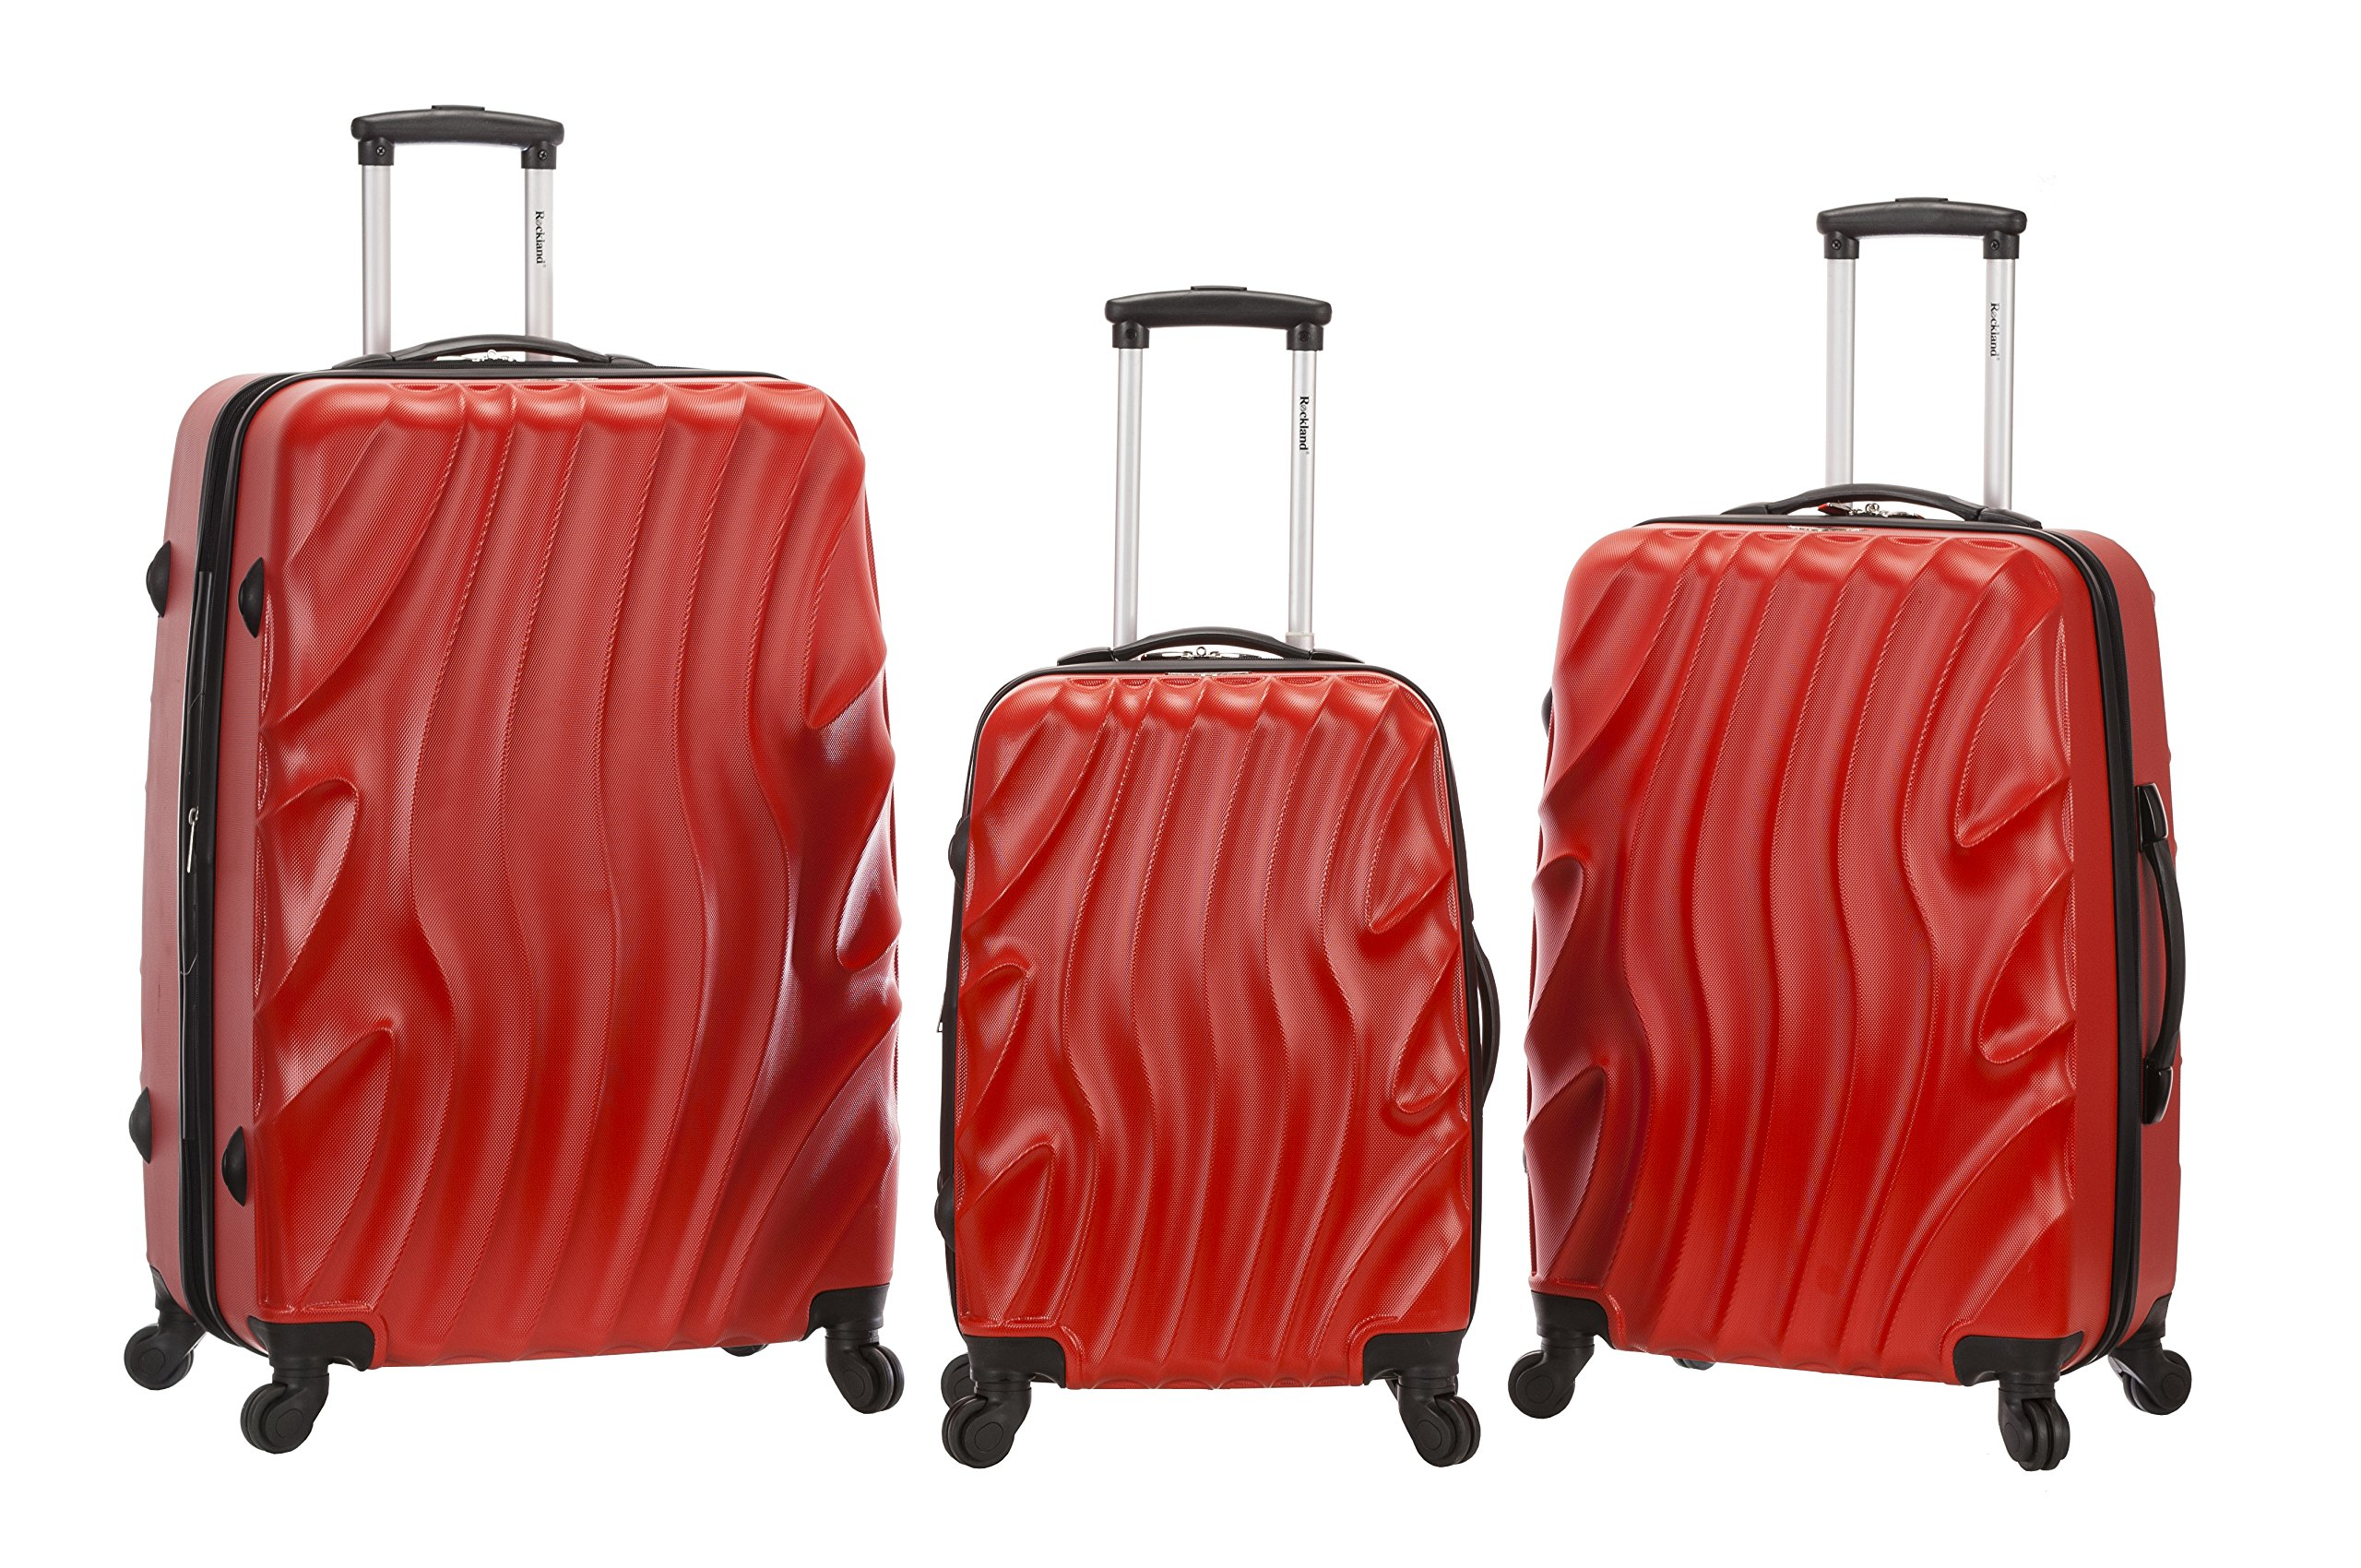 Rockland Melbourne 3 Pc Abs Luggage Set, Redwave